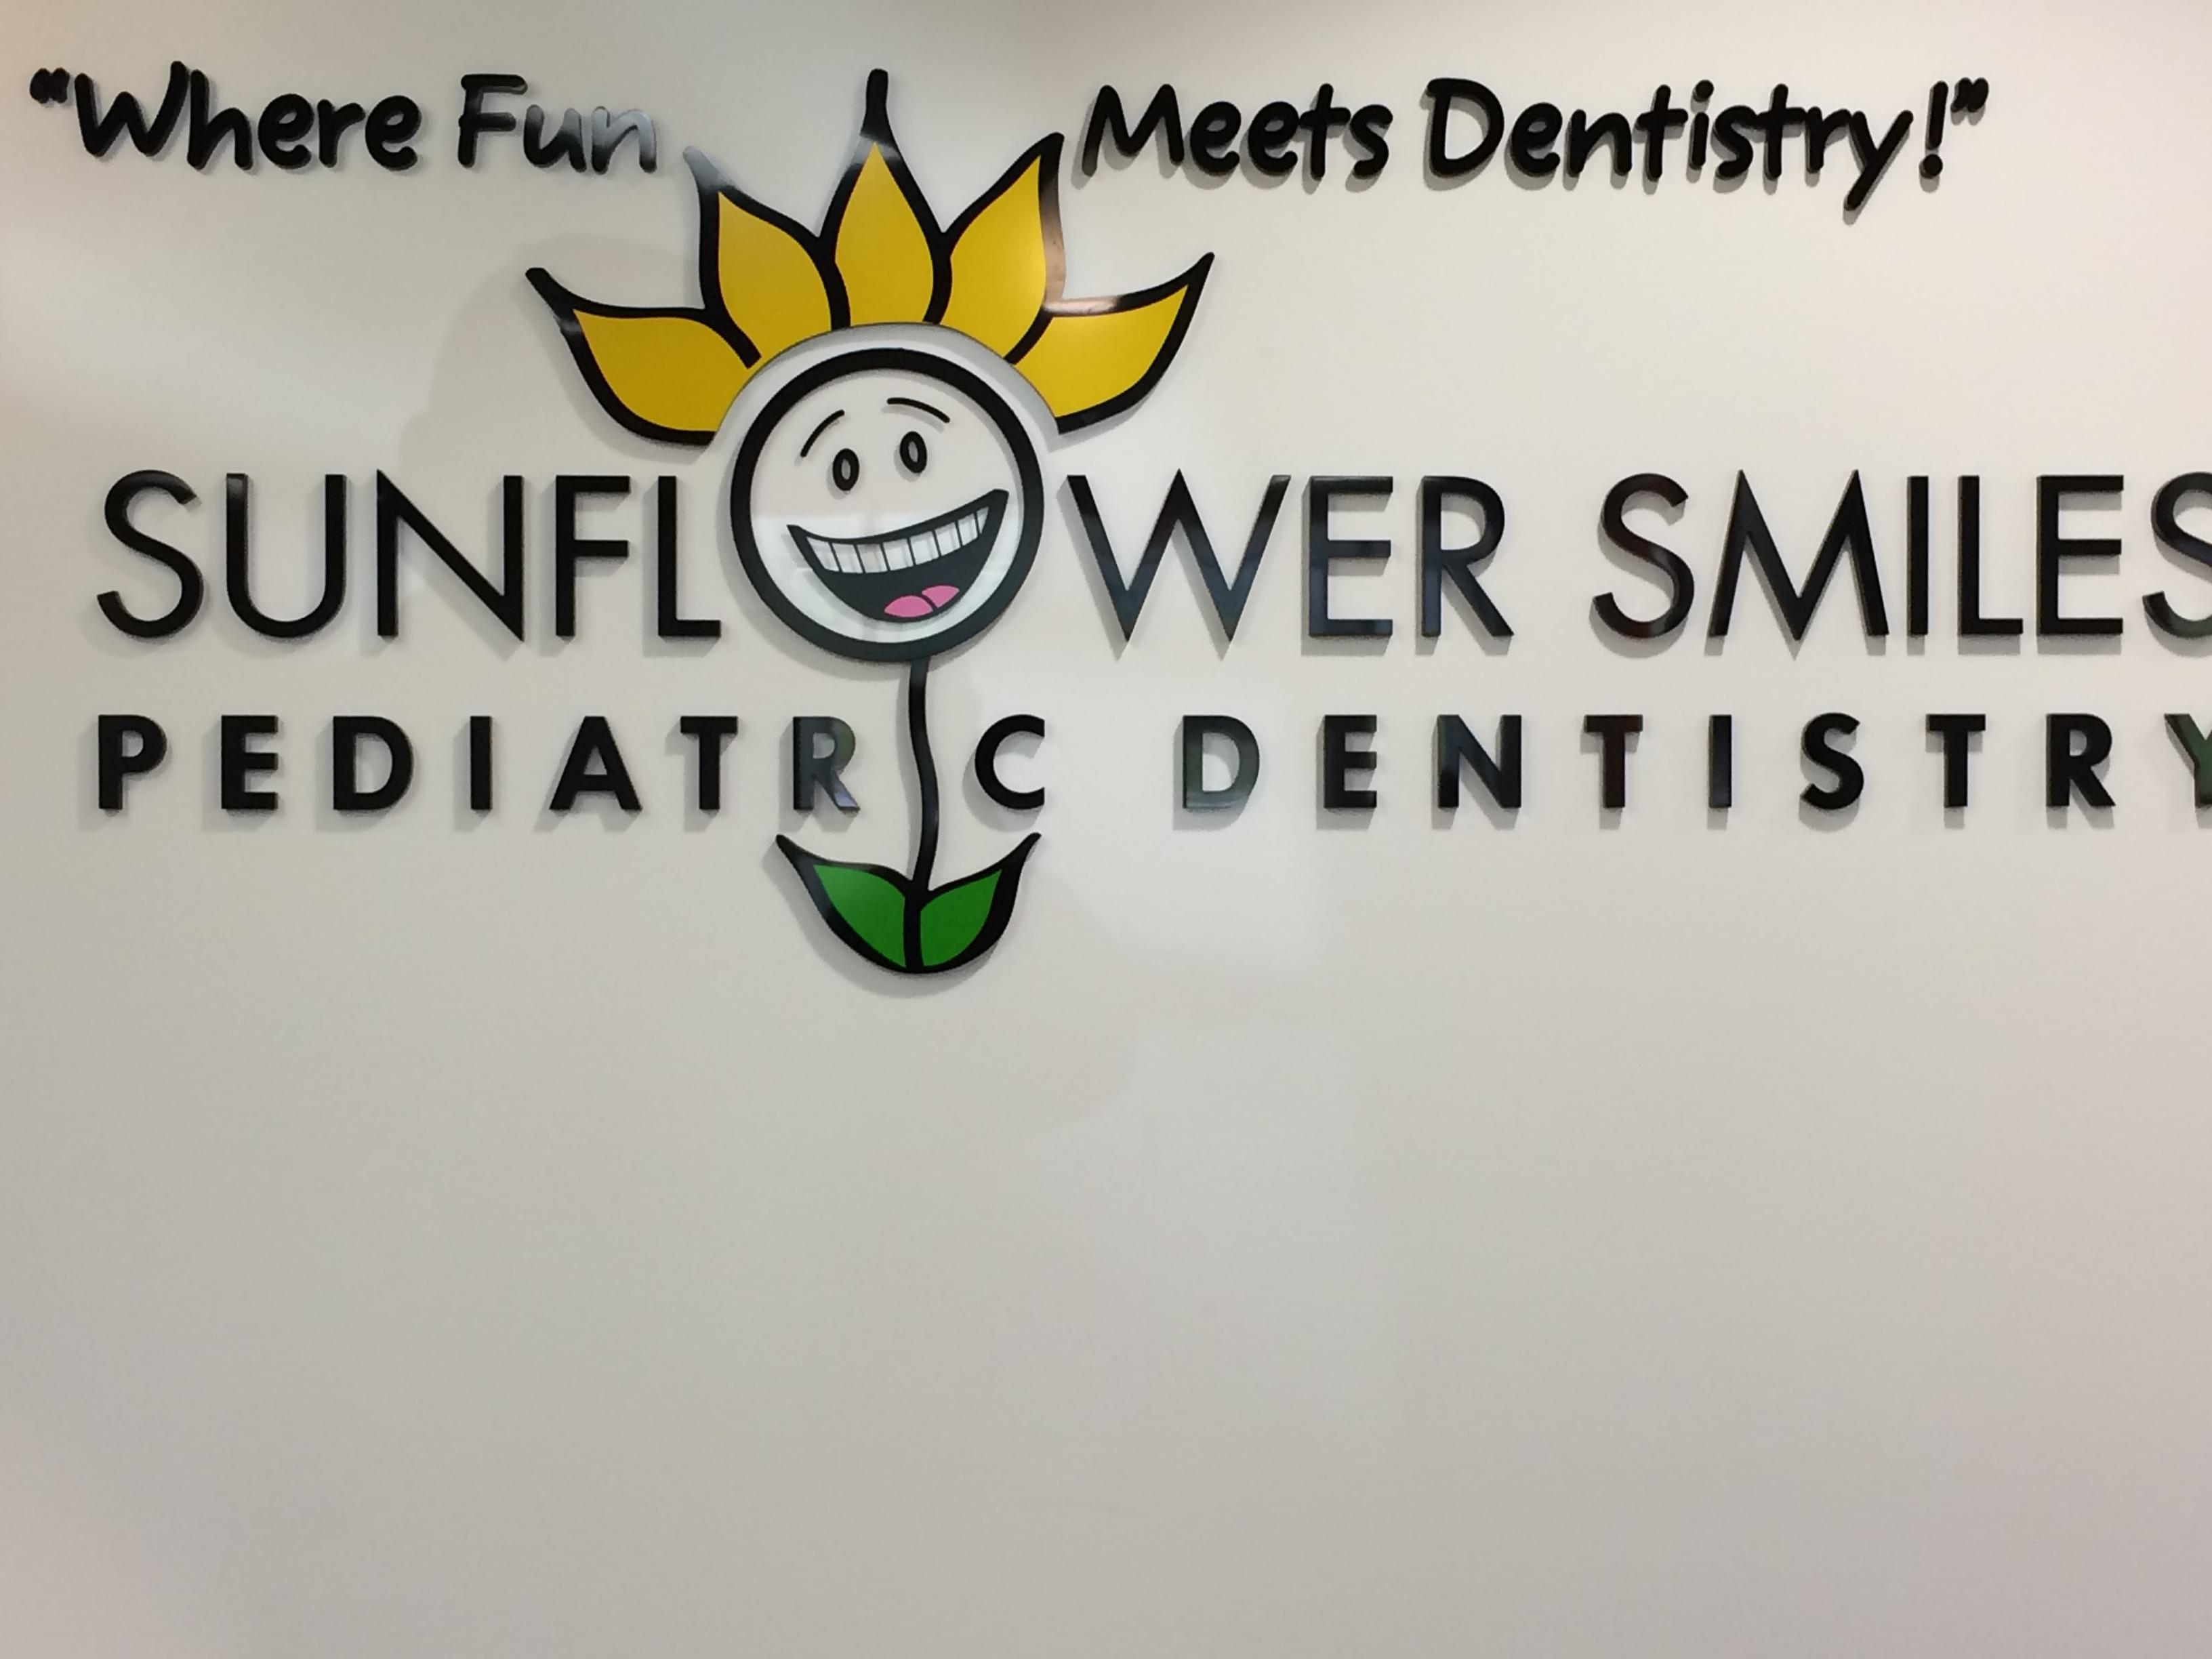 Sunflower Smiles Pediatric Dentistry image 1